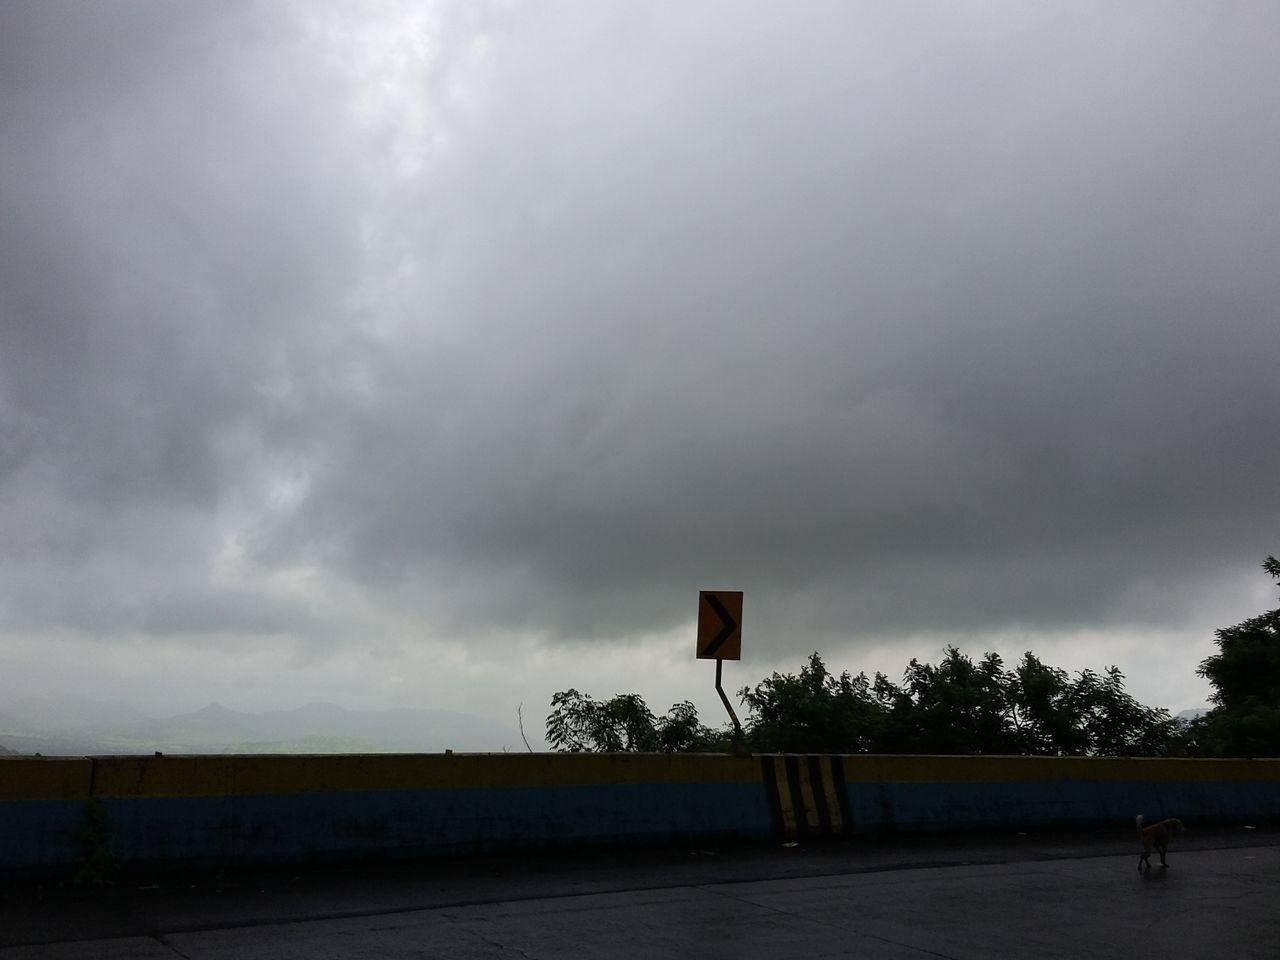 cloud - sky, sky, basketball - sport, basketball hoop, sport, court, outdoors, day, tree, storm cloud, nature, no people